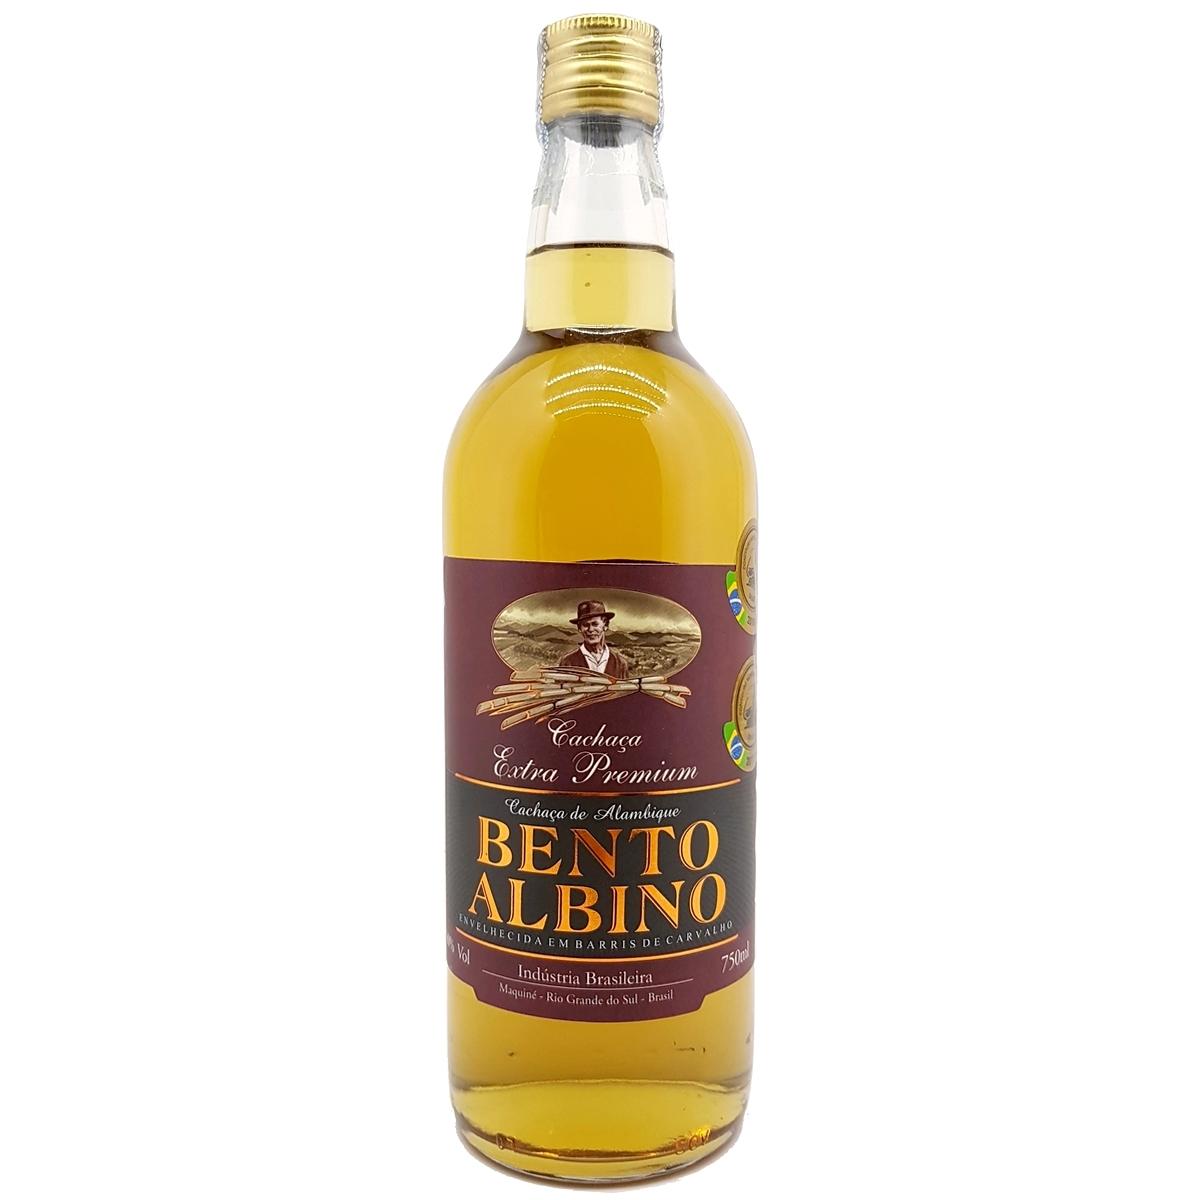 Cachaça Bento Albino Extra Premium 750ml